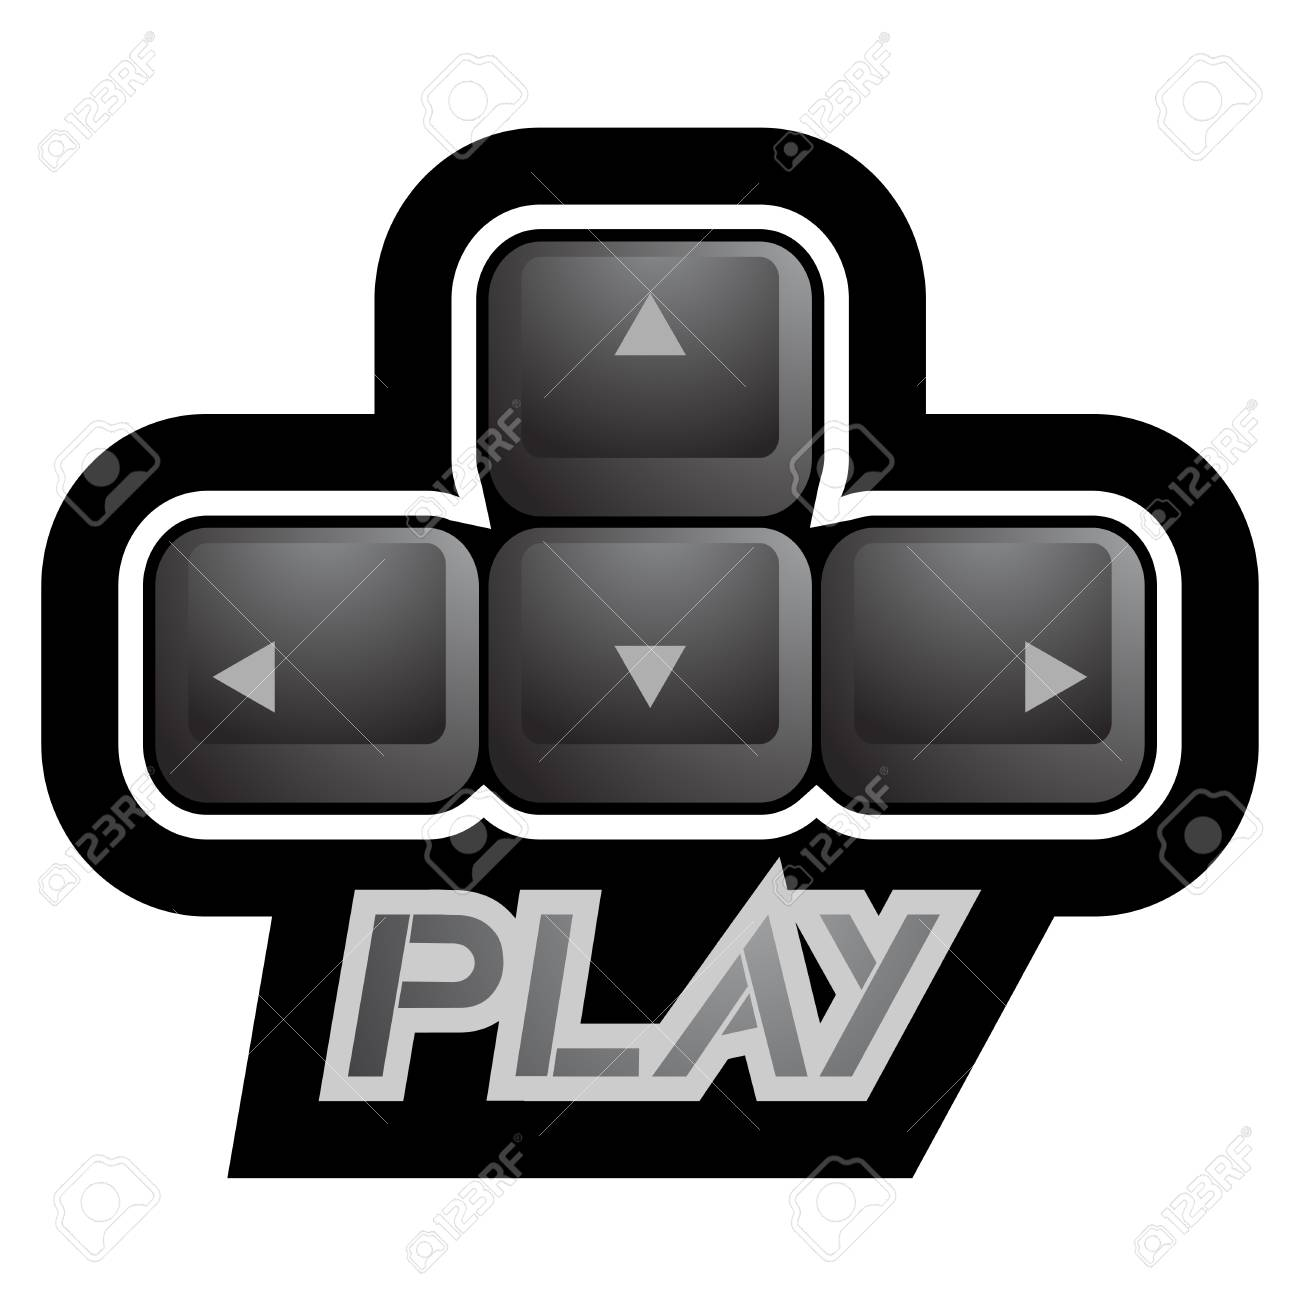 Play key symbol Stock Vector - 22394157